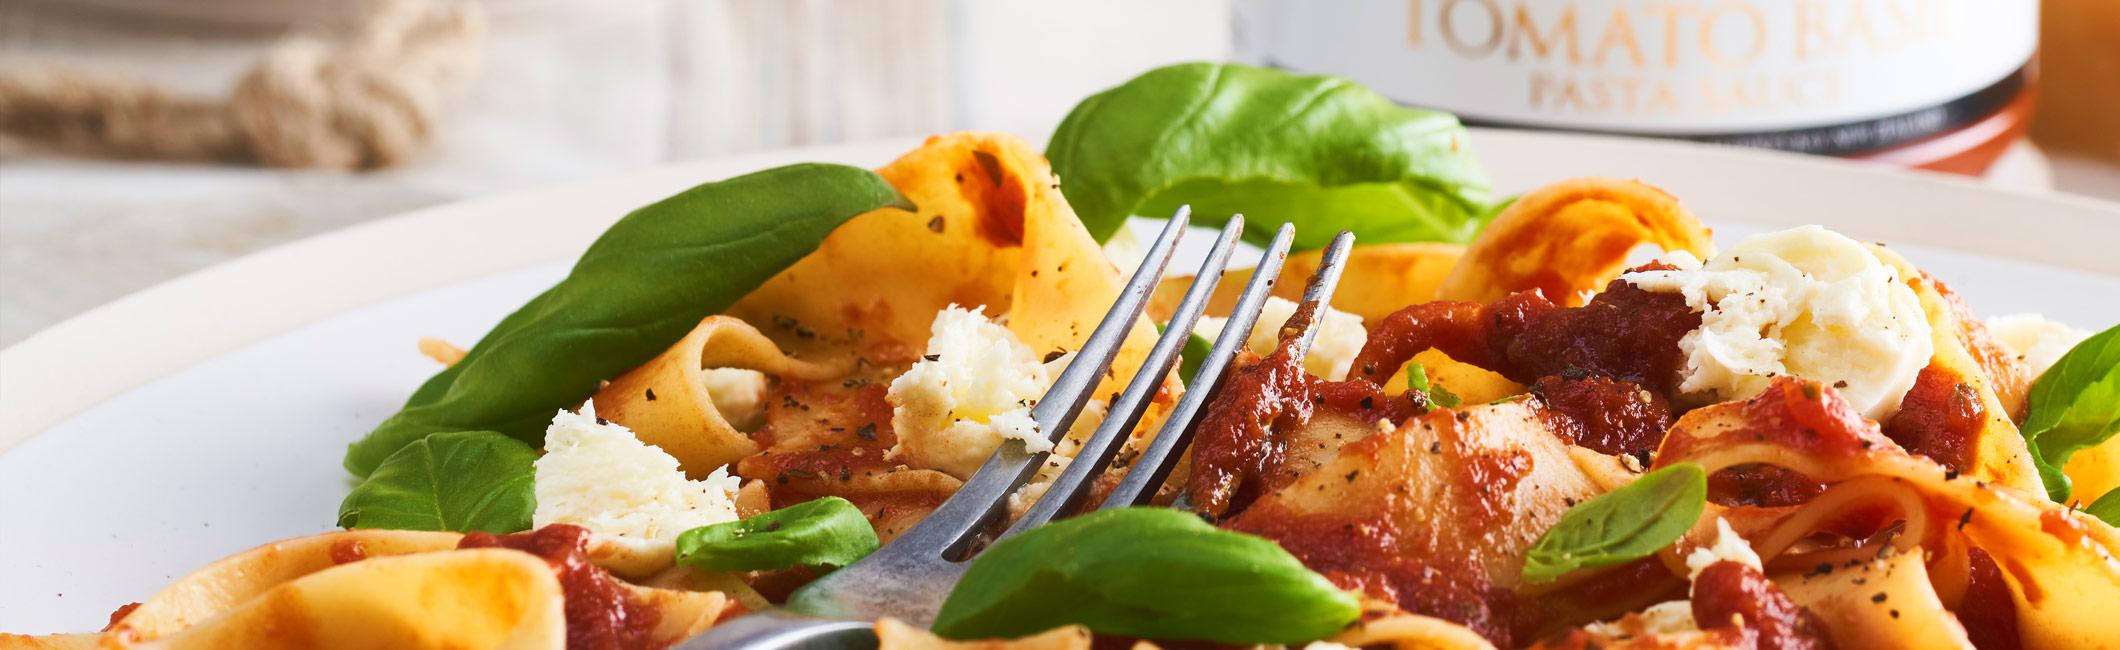 Pasta Sauce – Tomato Basil